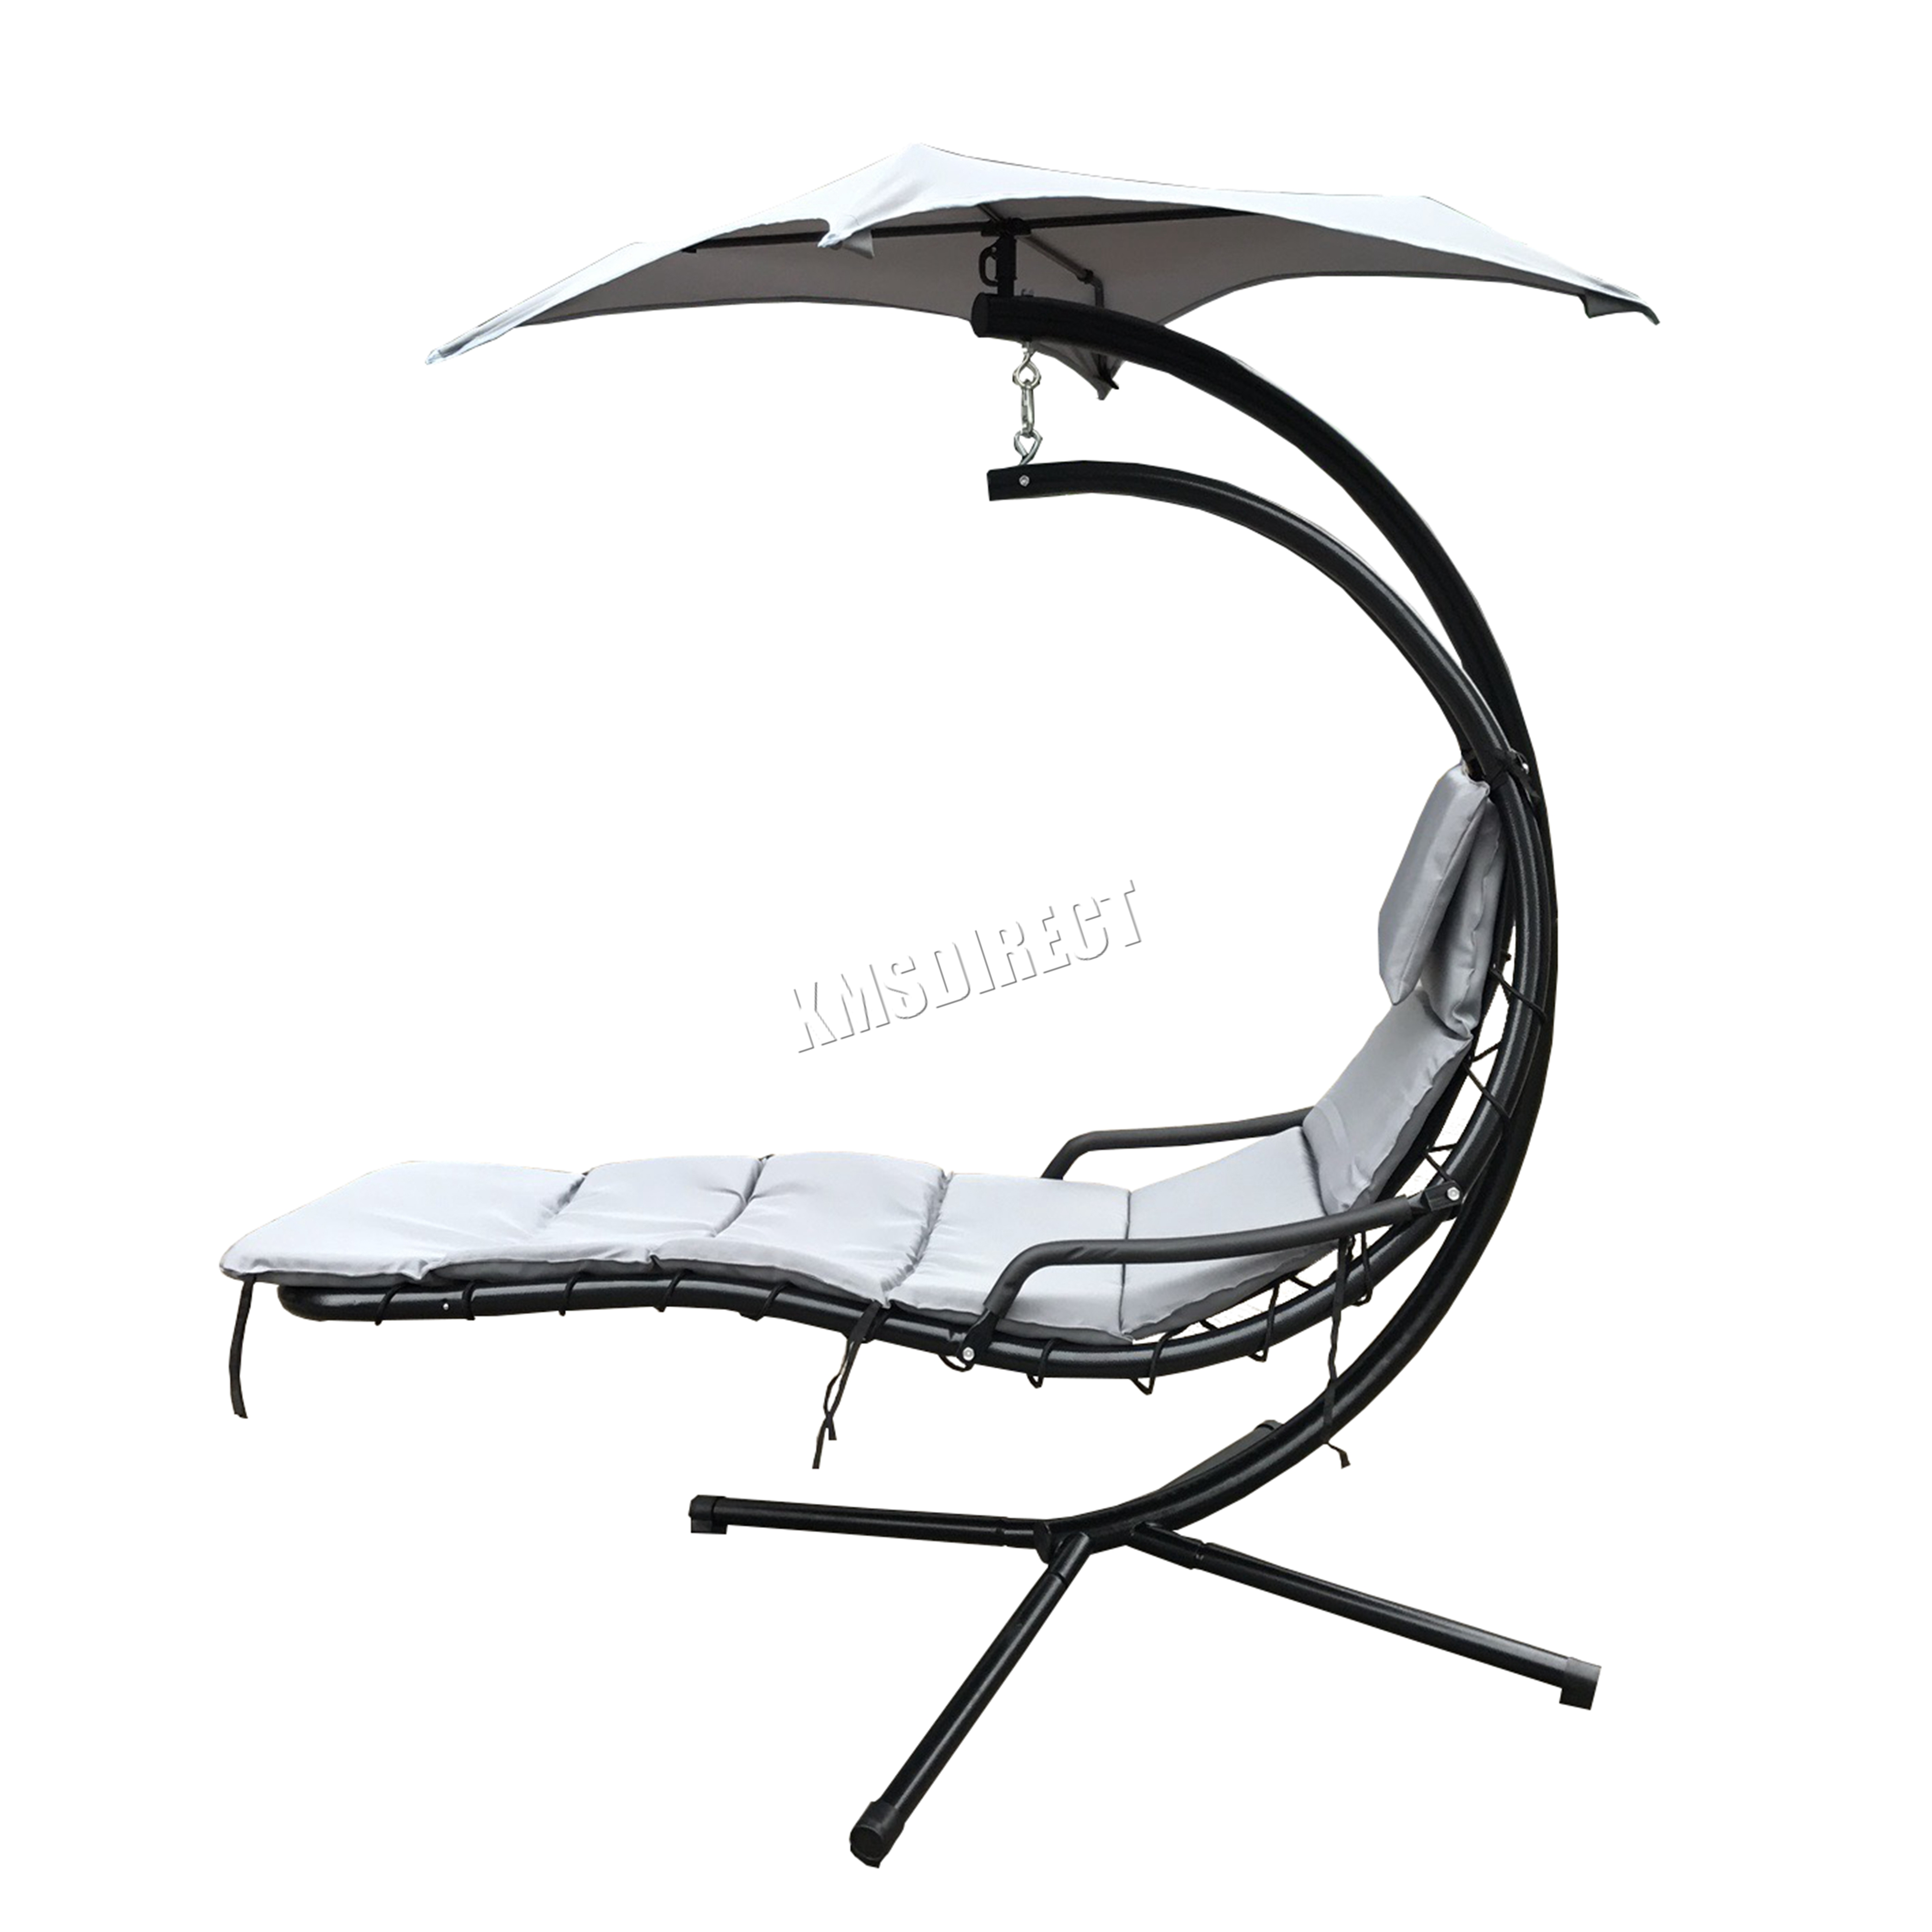 outdoor dream chair the revolving miami foxhunter garden helicopter swing